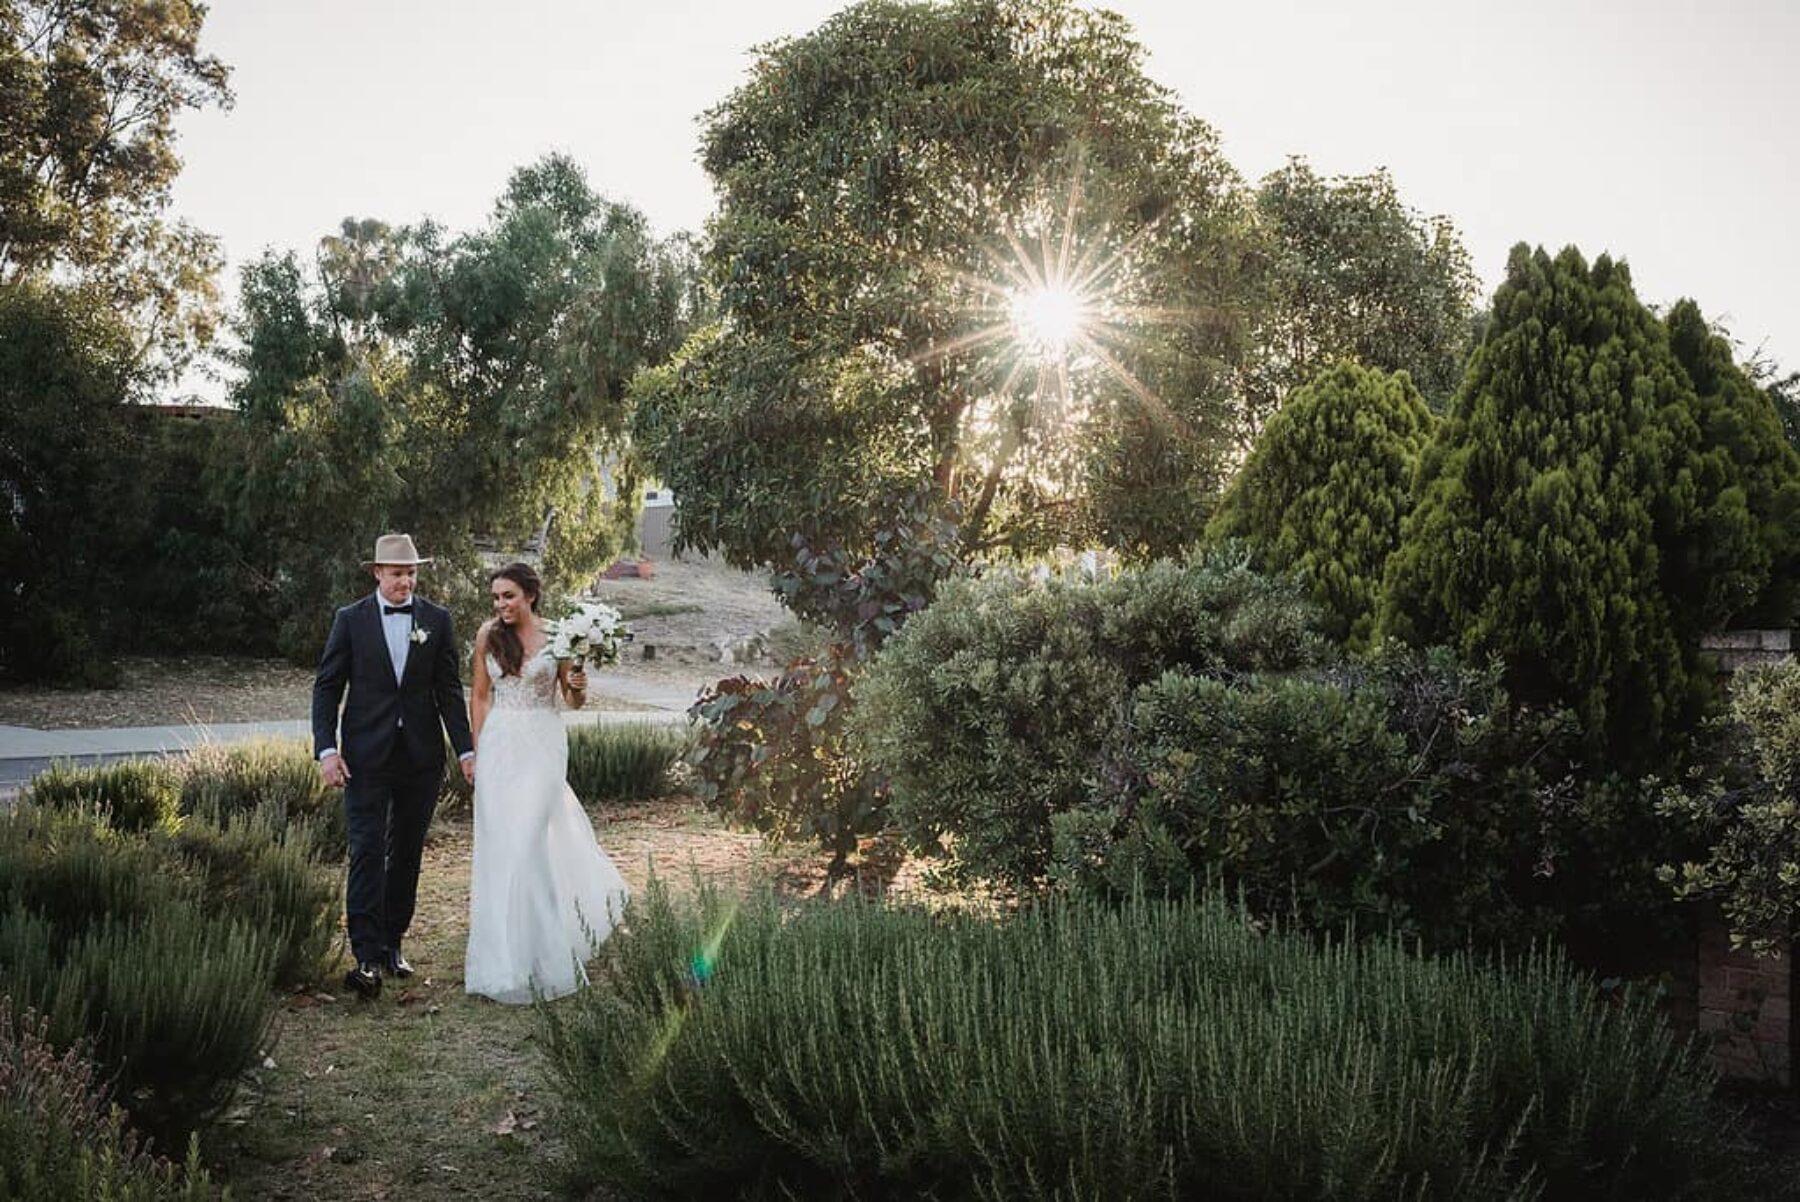 Modern backyard wedding in Perth WA / Photography by CJ Williams